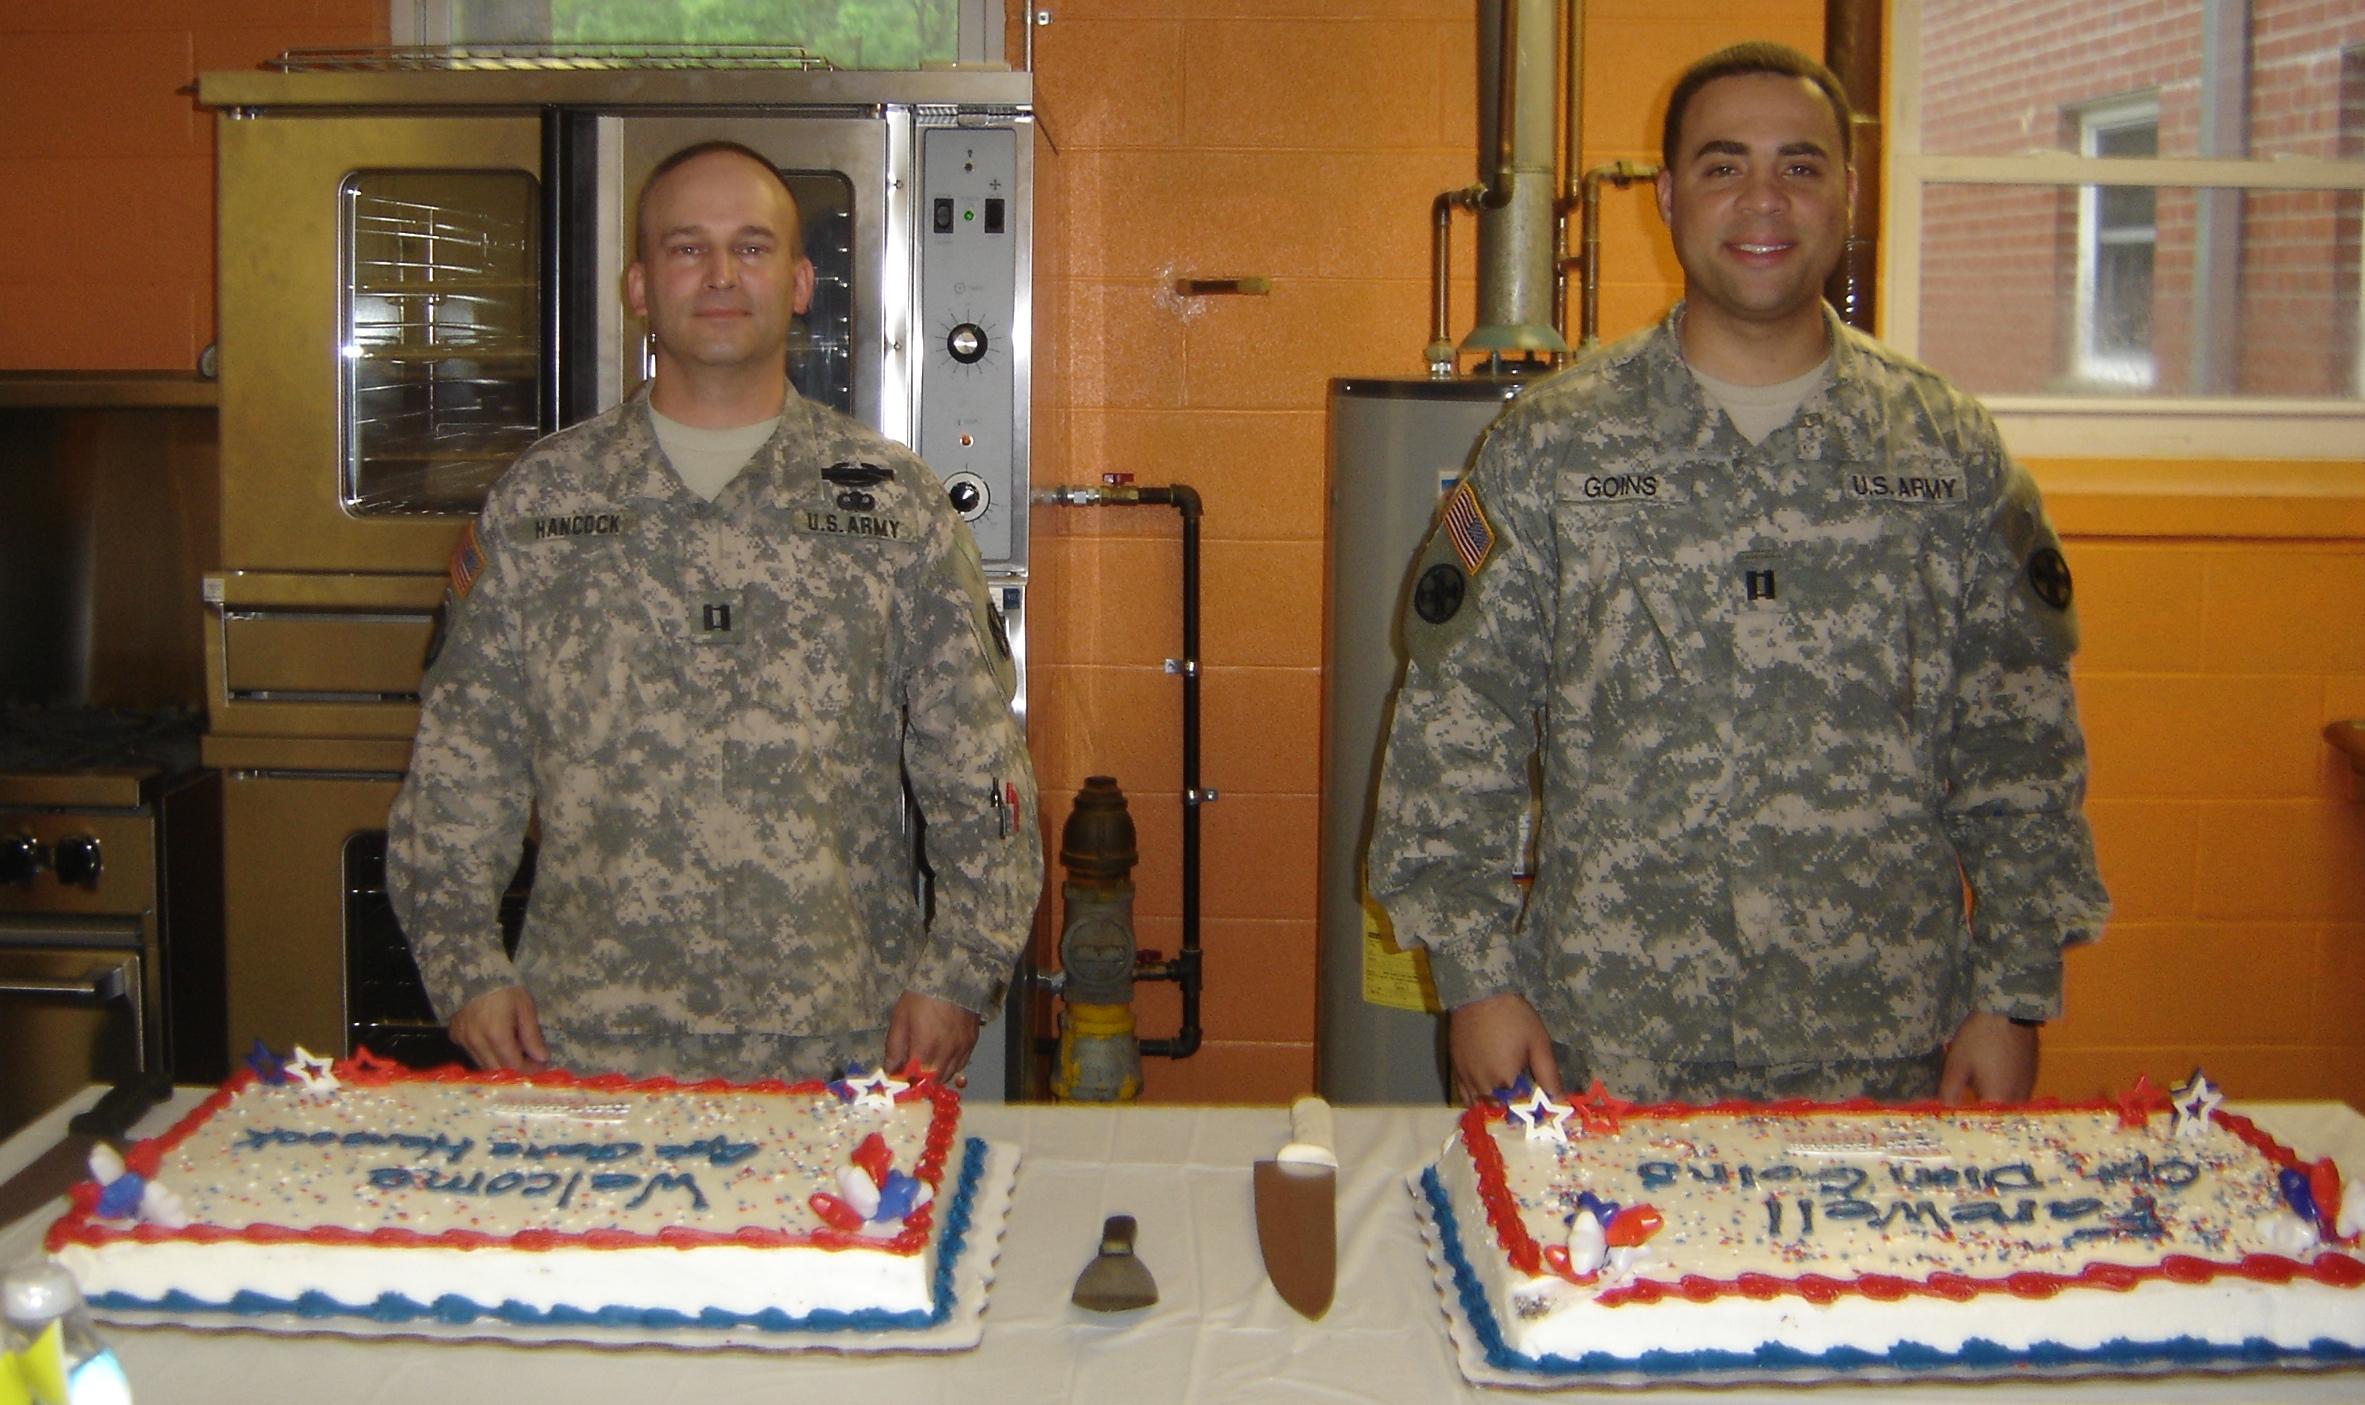 The Ohio National Guard